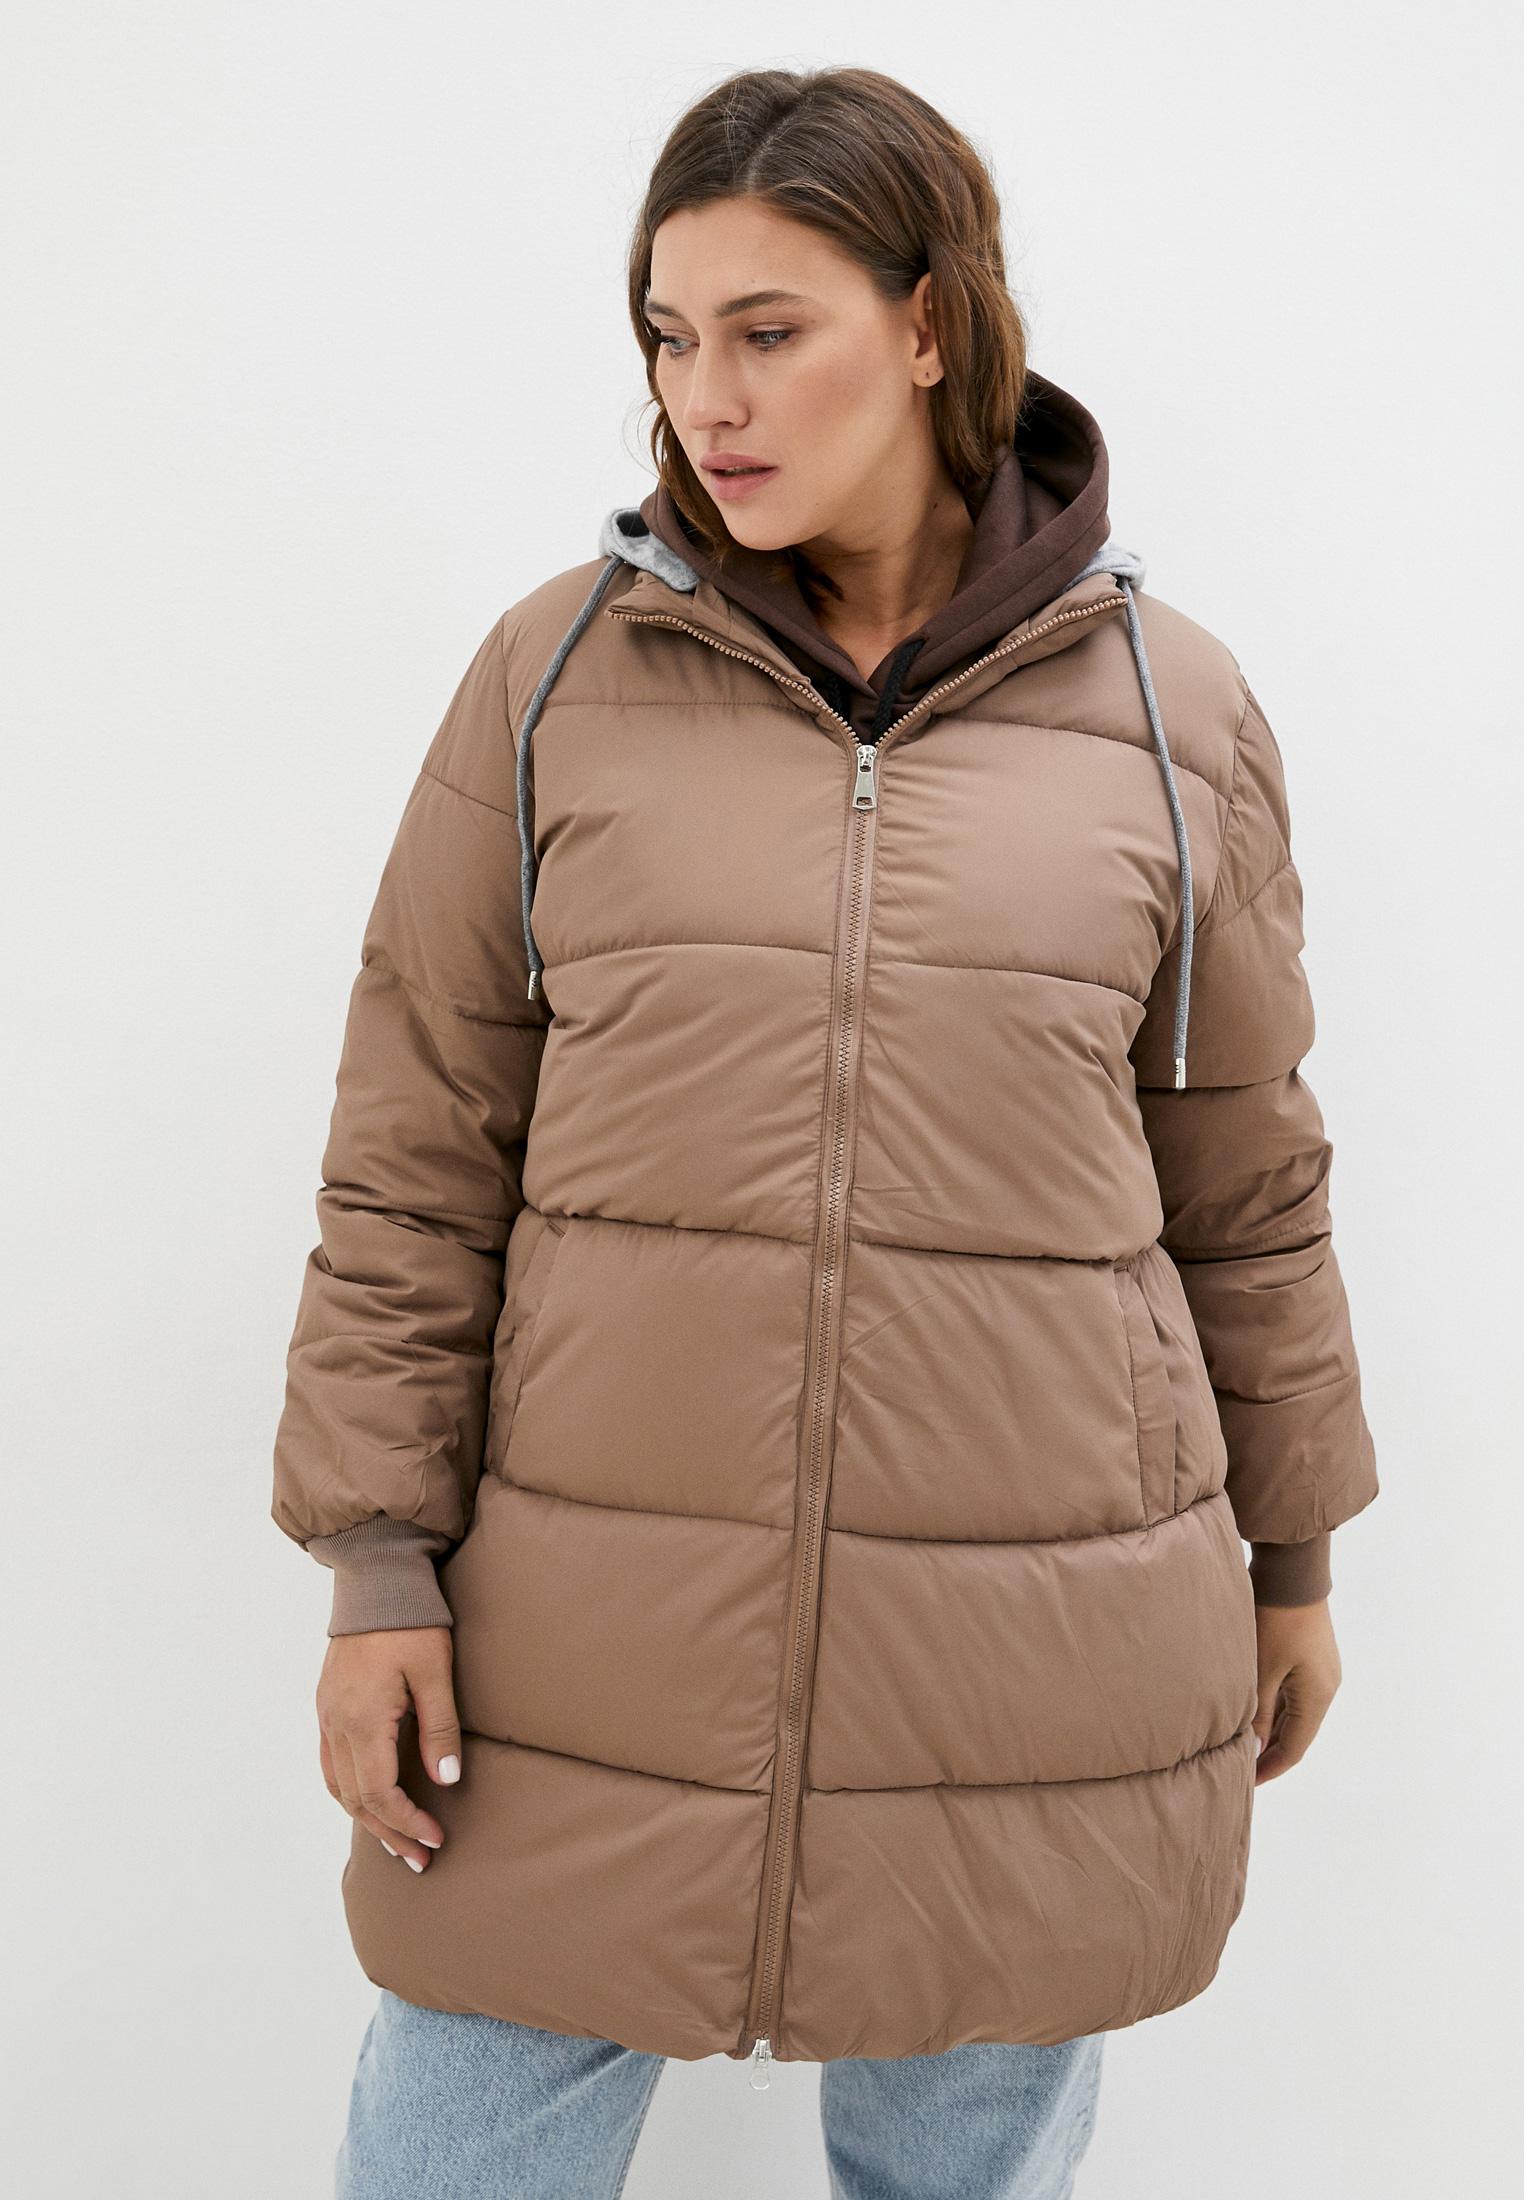 Утепленная куртка Snow Airwolf Куртка утепленная Snow Airwolf